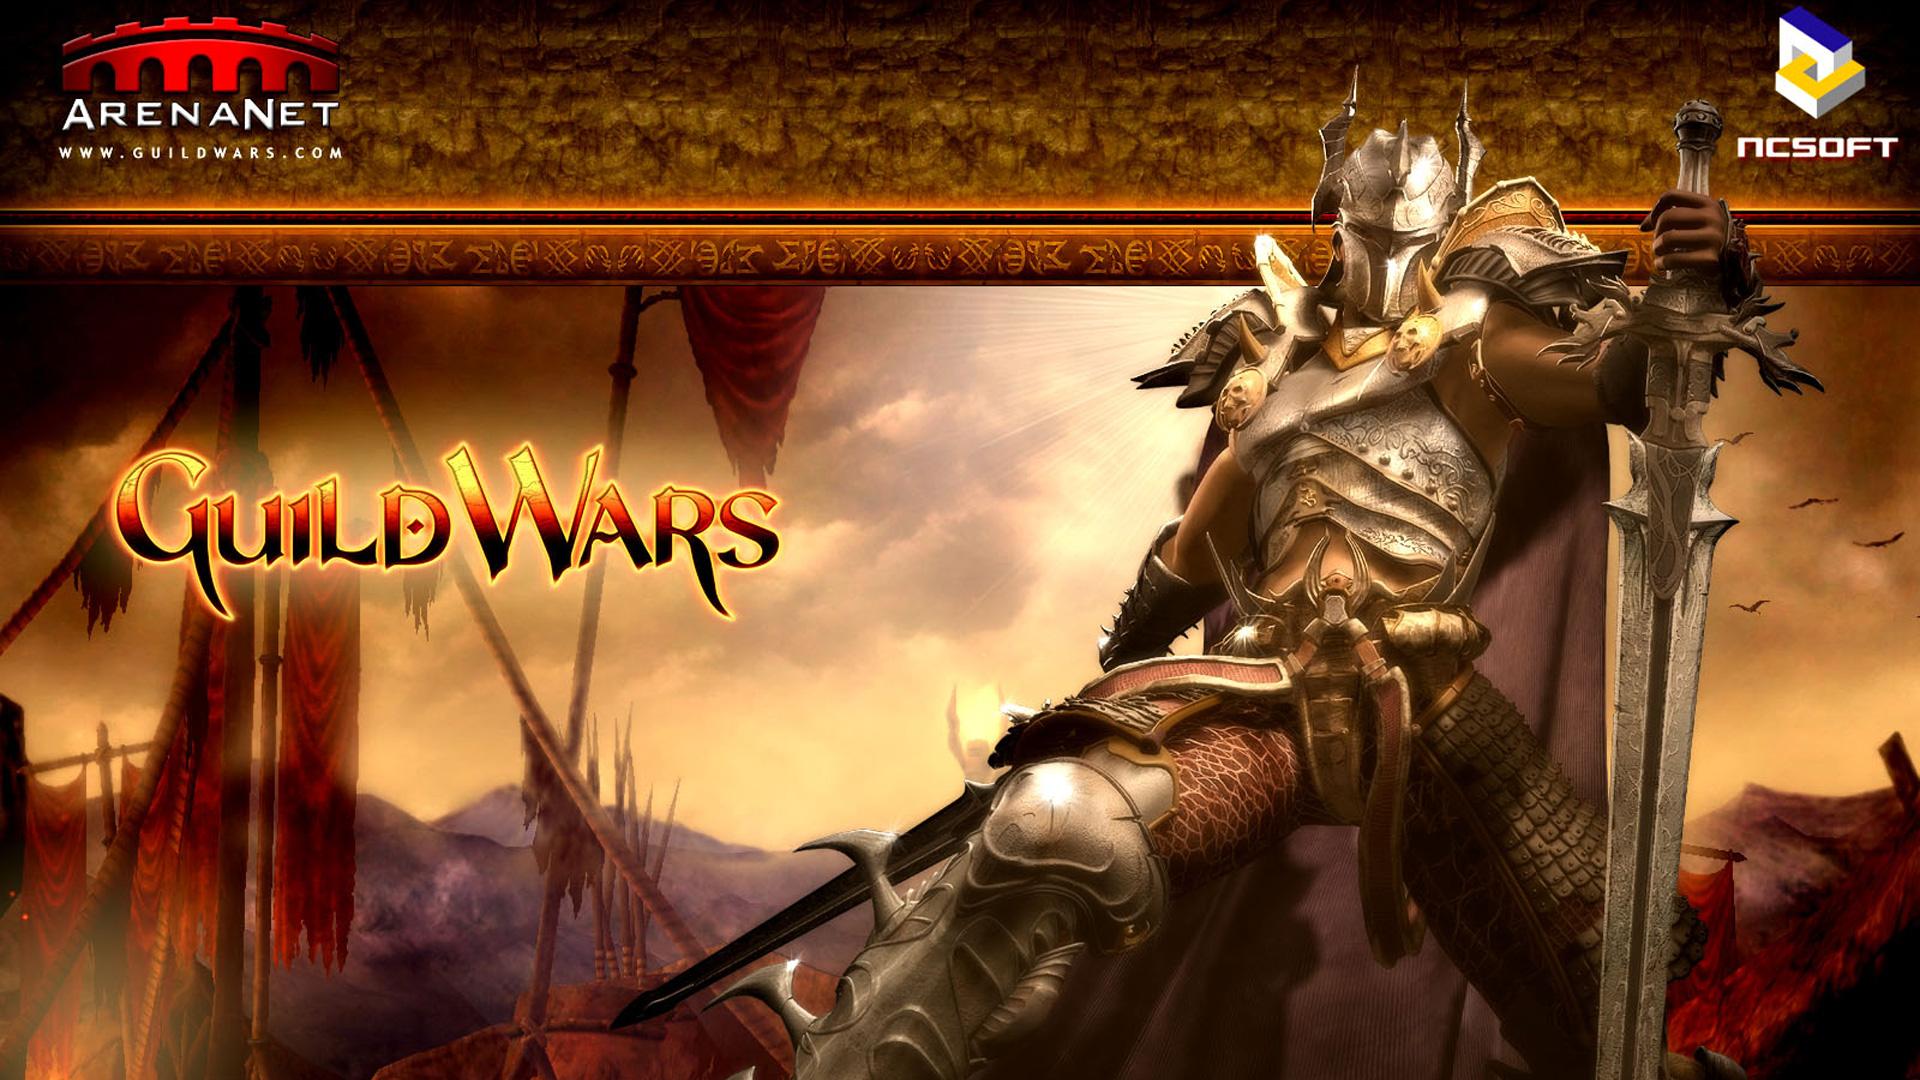 Guild Wars wallpaper 13